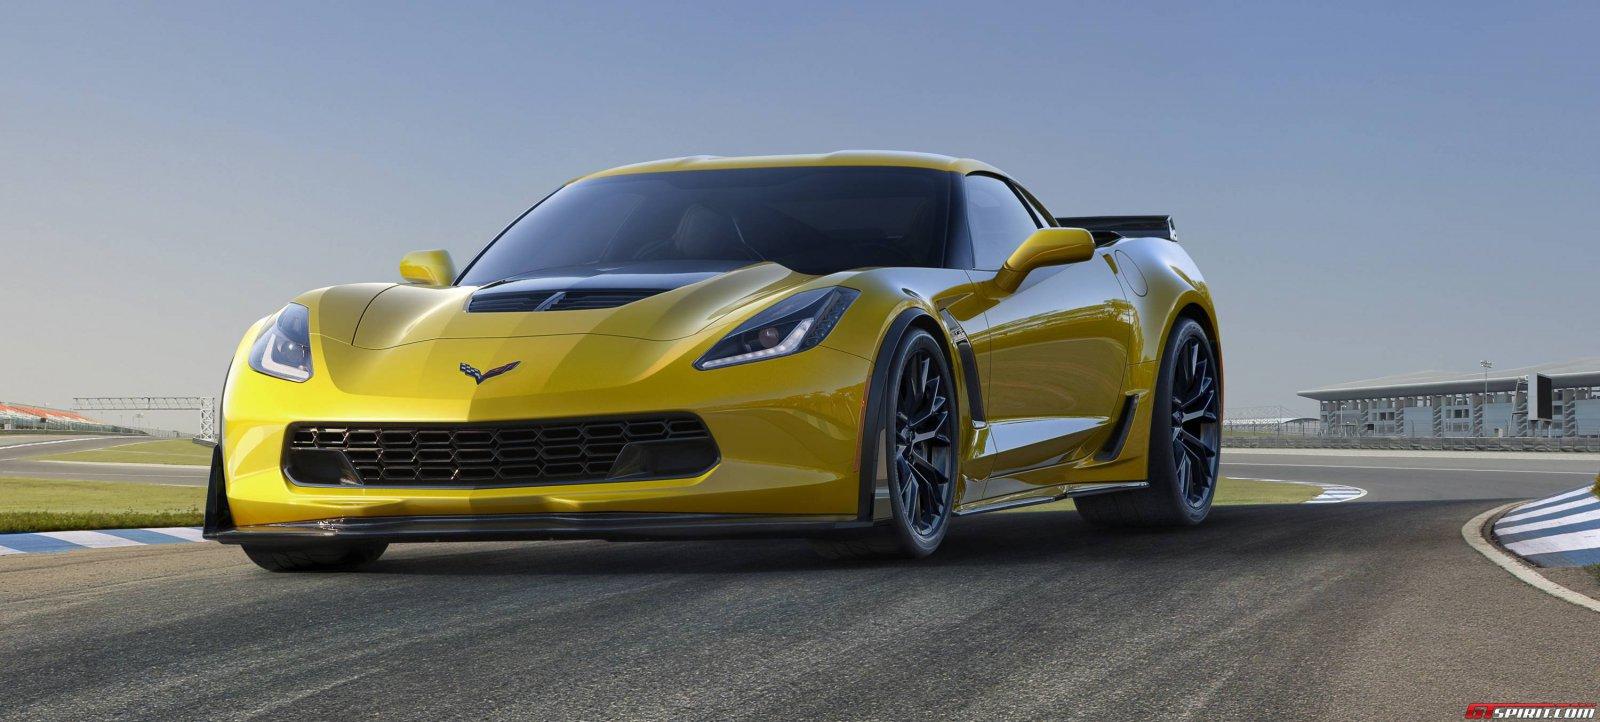 new chevrolet corvette zr1 not currently on the cards gtspirit. Black Bedroom Furniture Sets. Home Design Ideas